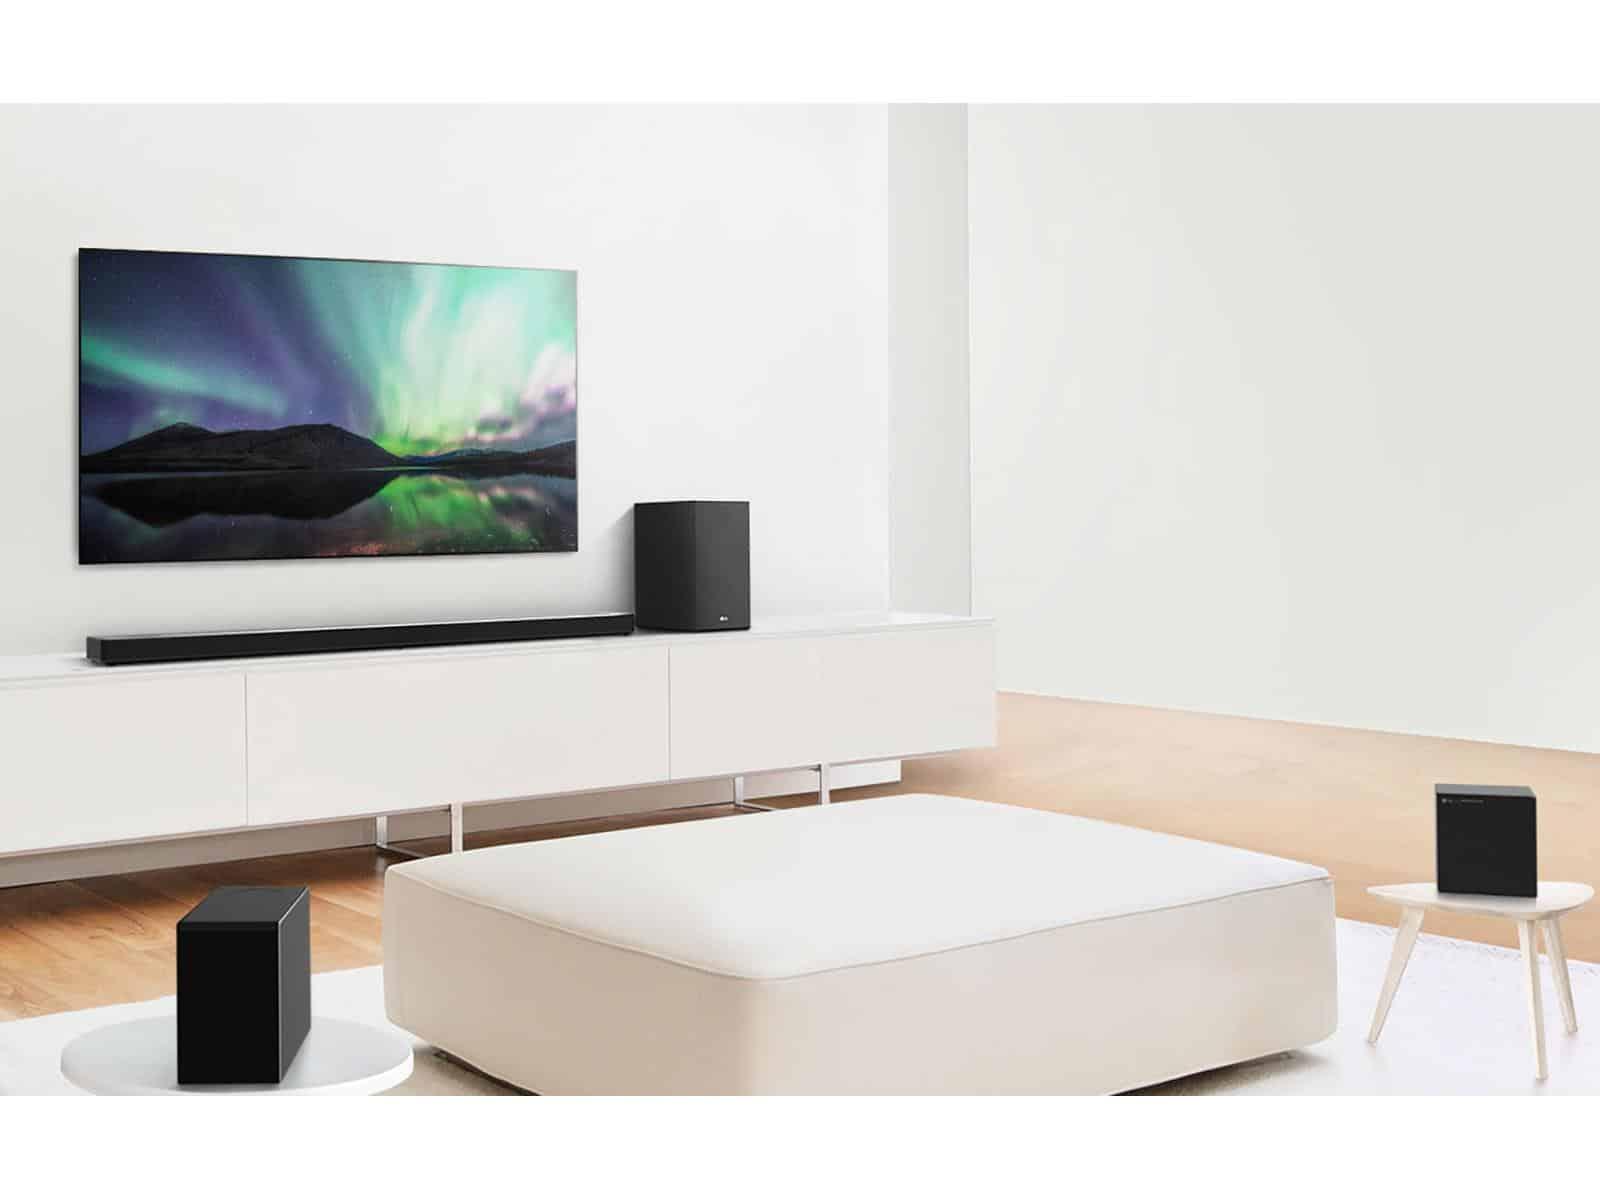 LG unveils new soundbars with AI calibration